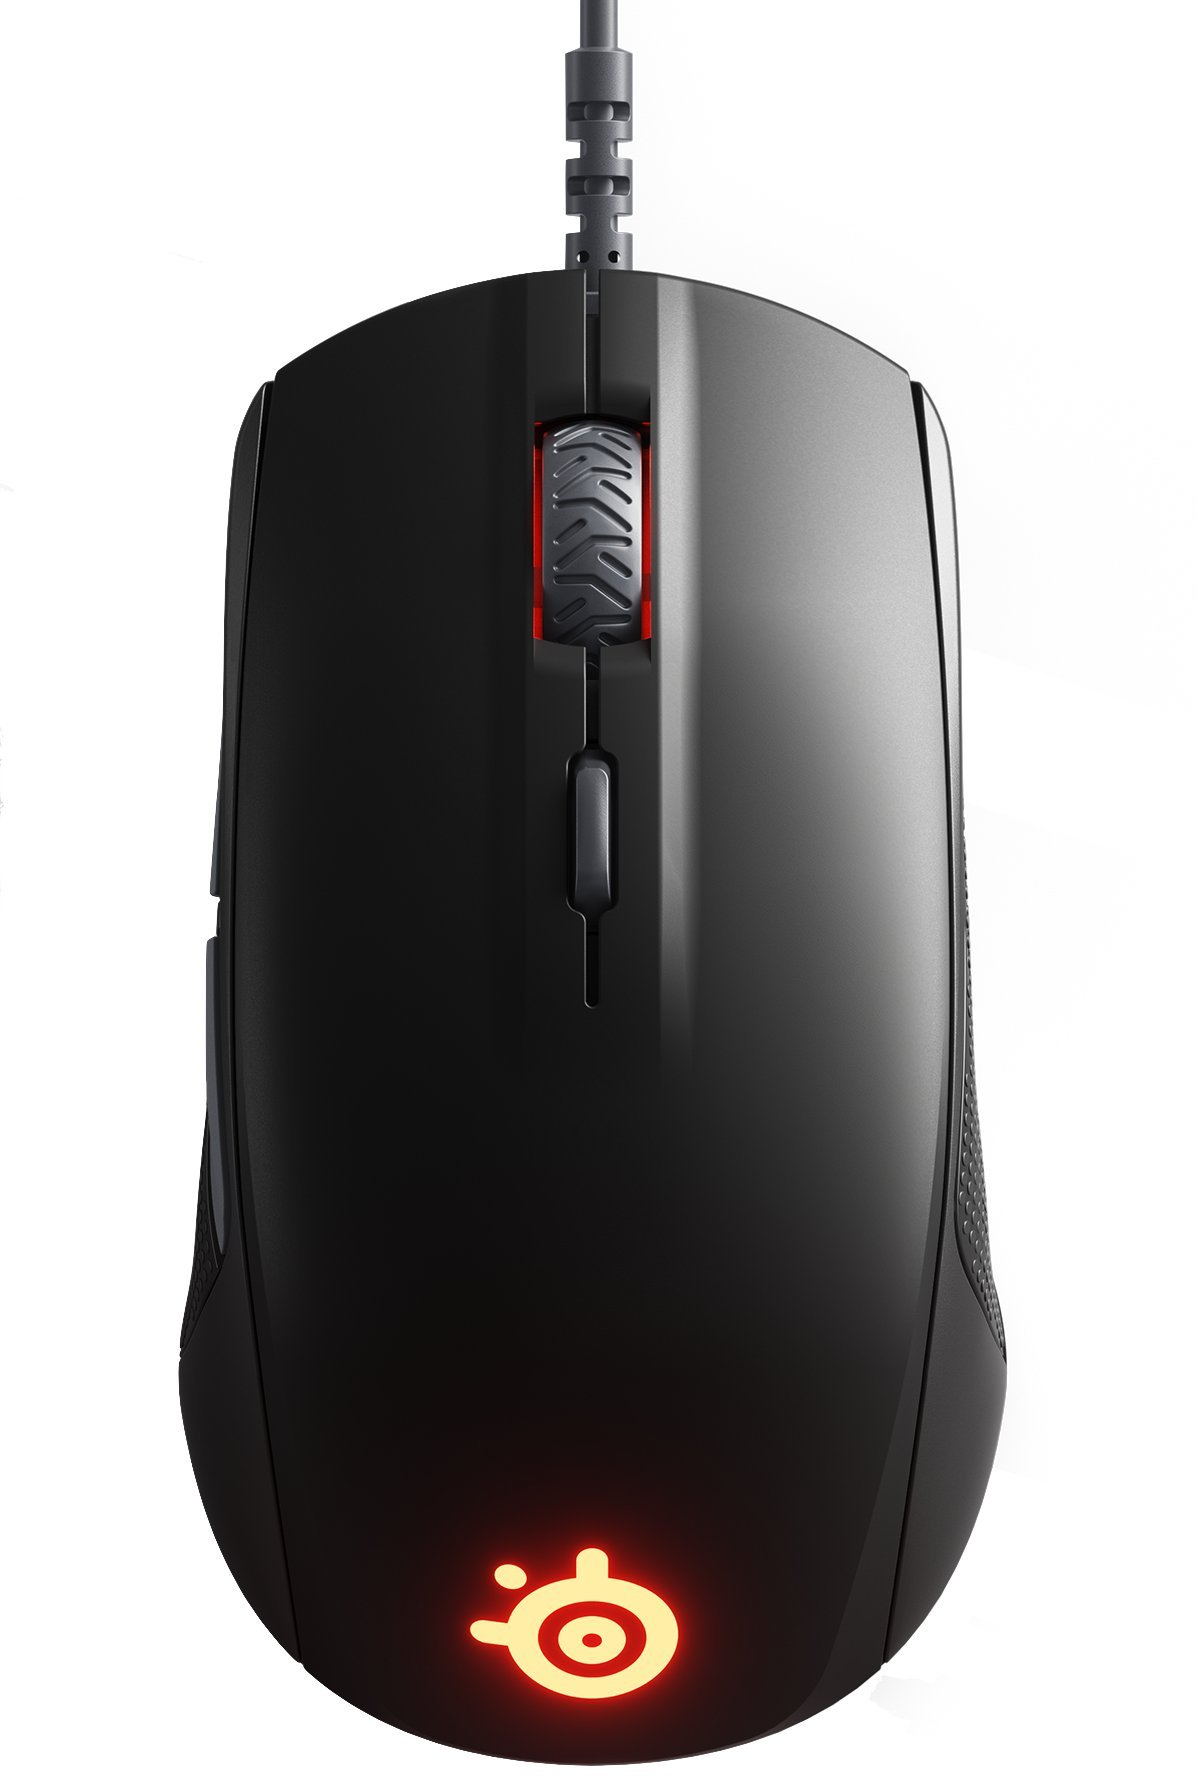 SteelSeries Rival 110 Gaming Mouse - 7,200 CPI TrueMove1 Optical Sensor - Lightweight Design - RGB Lighting by SteelSeries